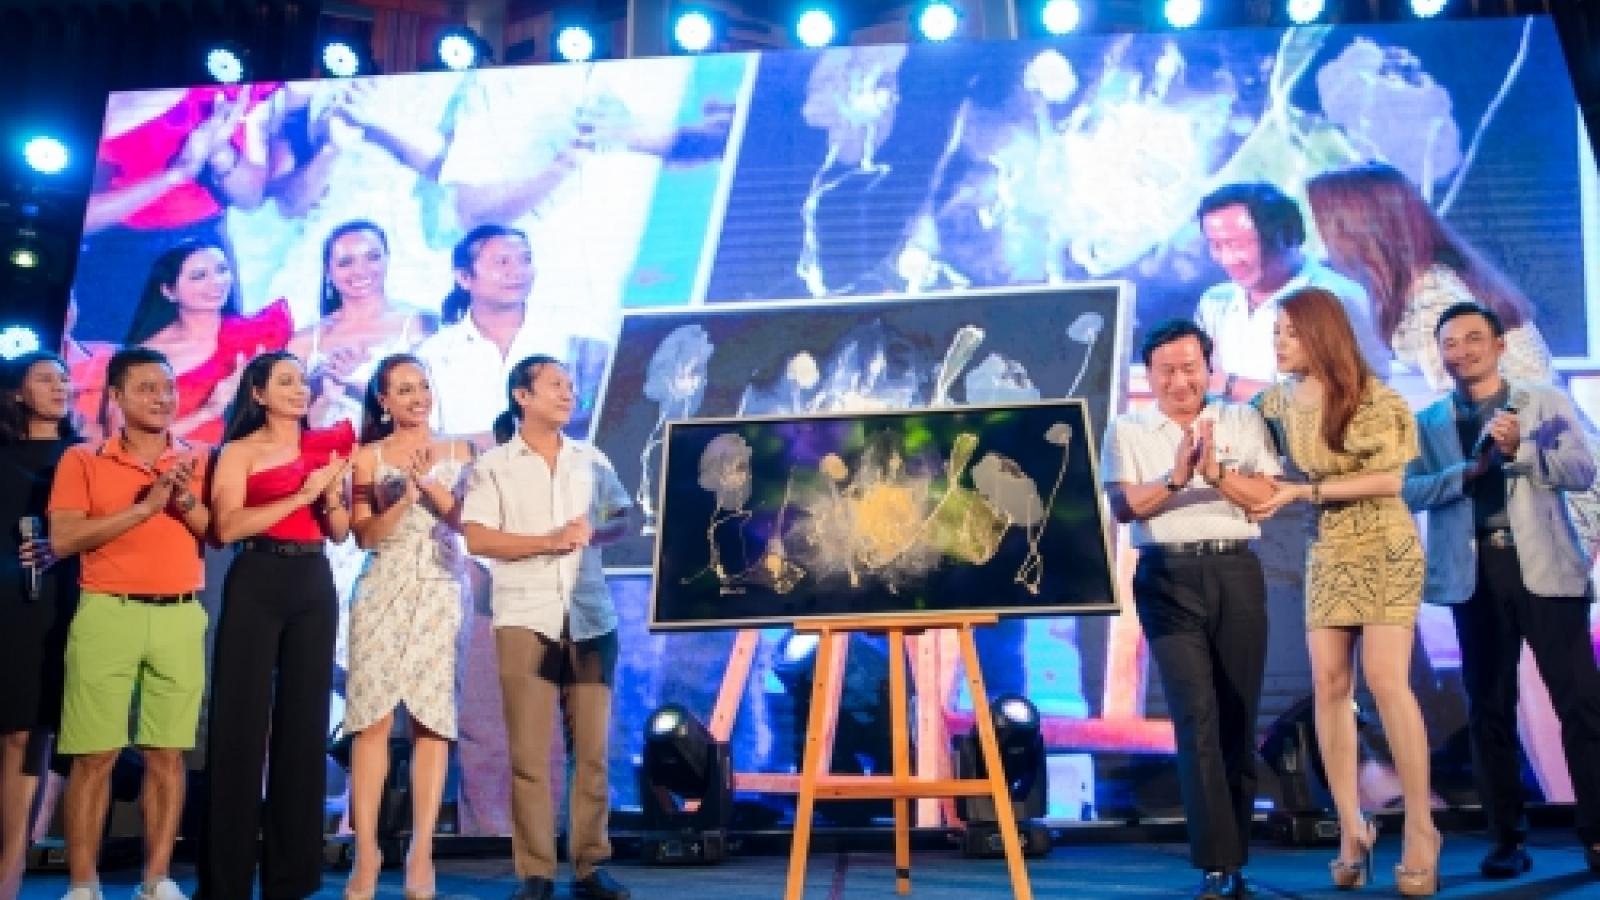 Charity night raises VND1.4 billion for children with congenital heart disease